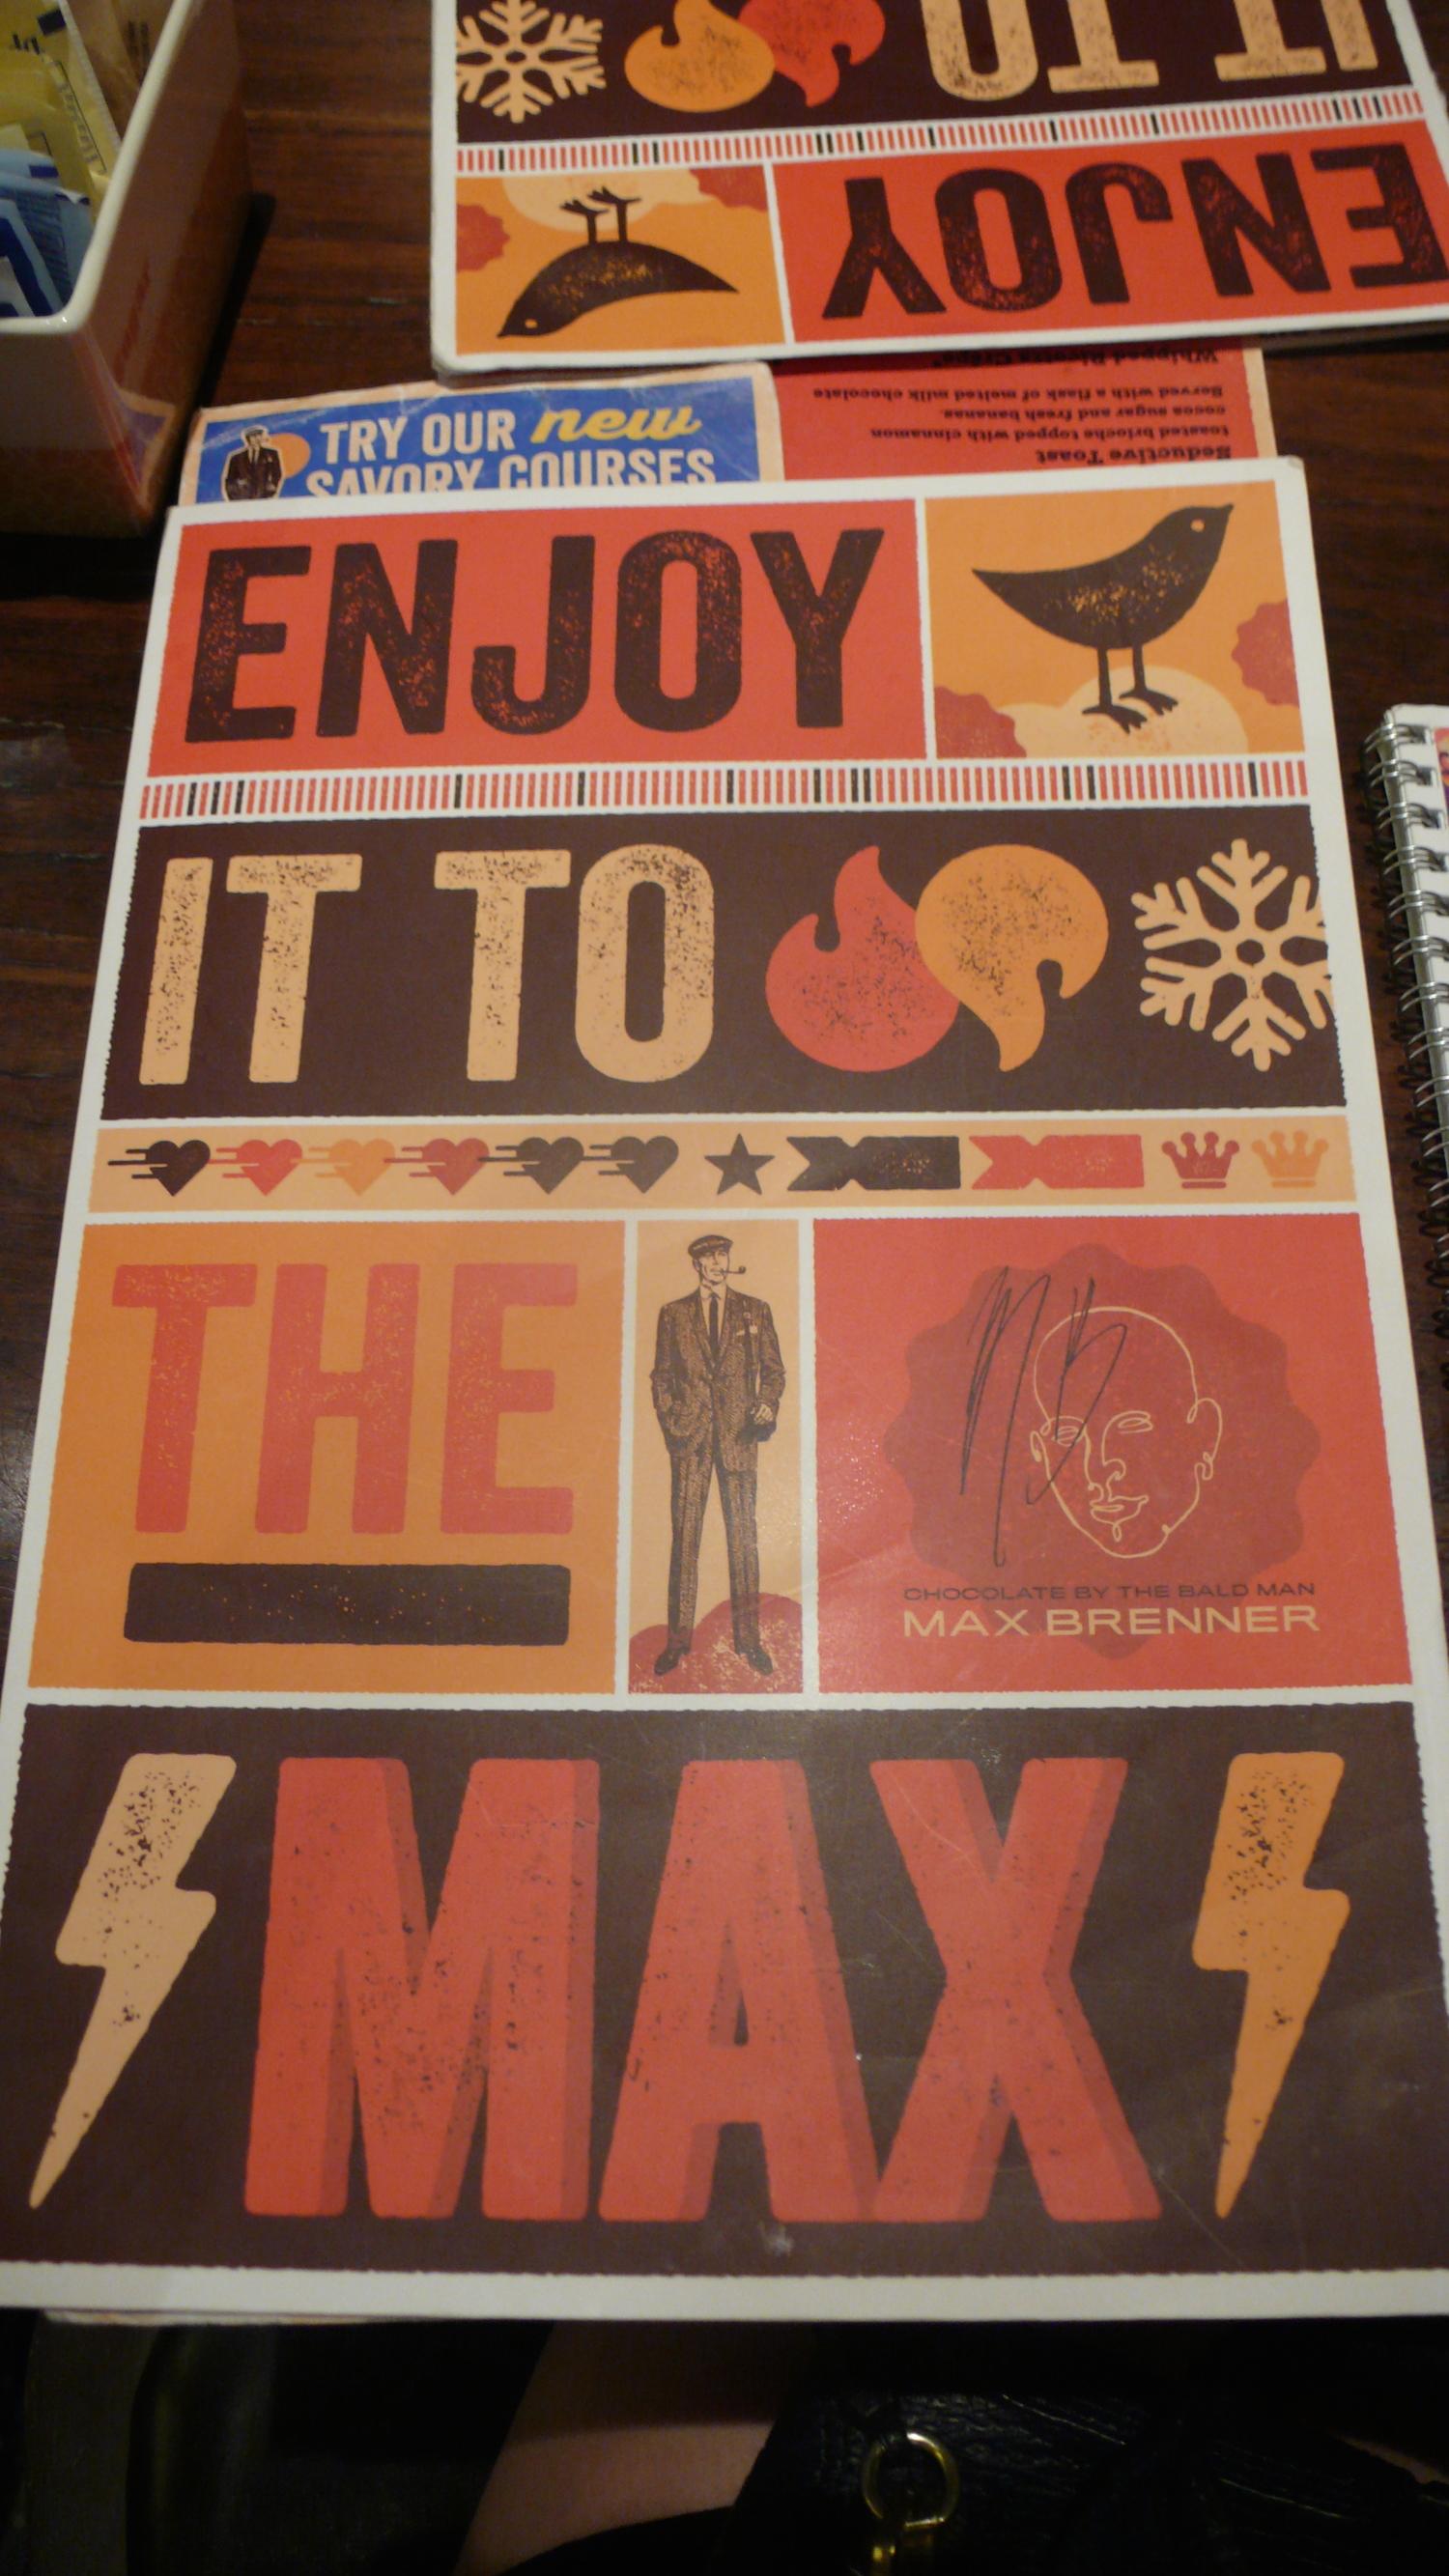 Max Brenner 不只在食物上很有創意 店家的branding也做得非常好 不管是店內裝潢或是菜單都特別設計過 也很有自己的風格